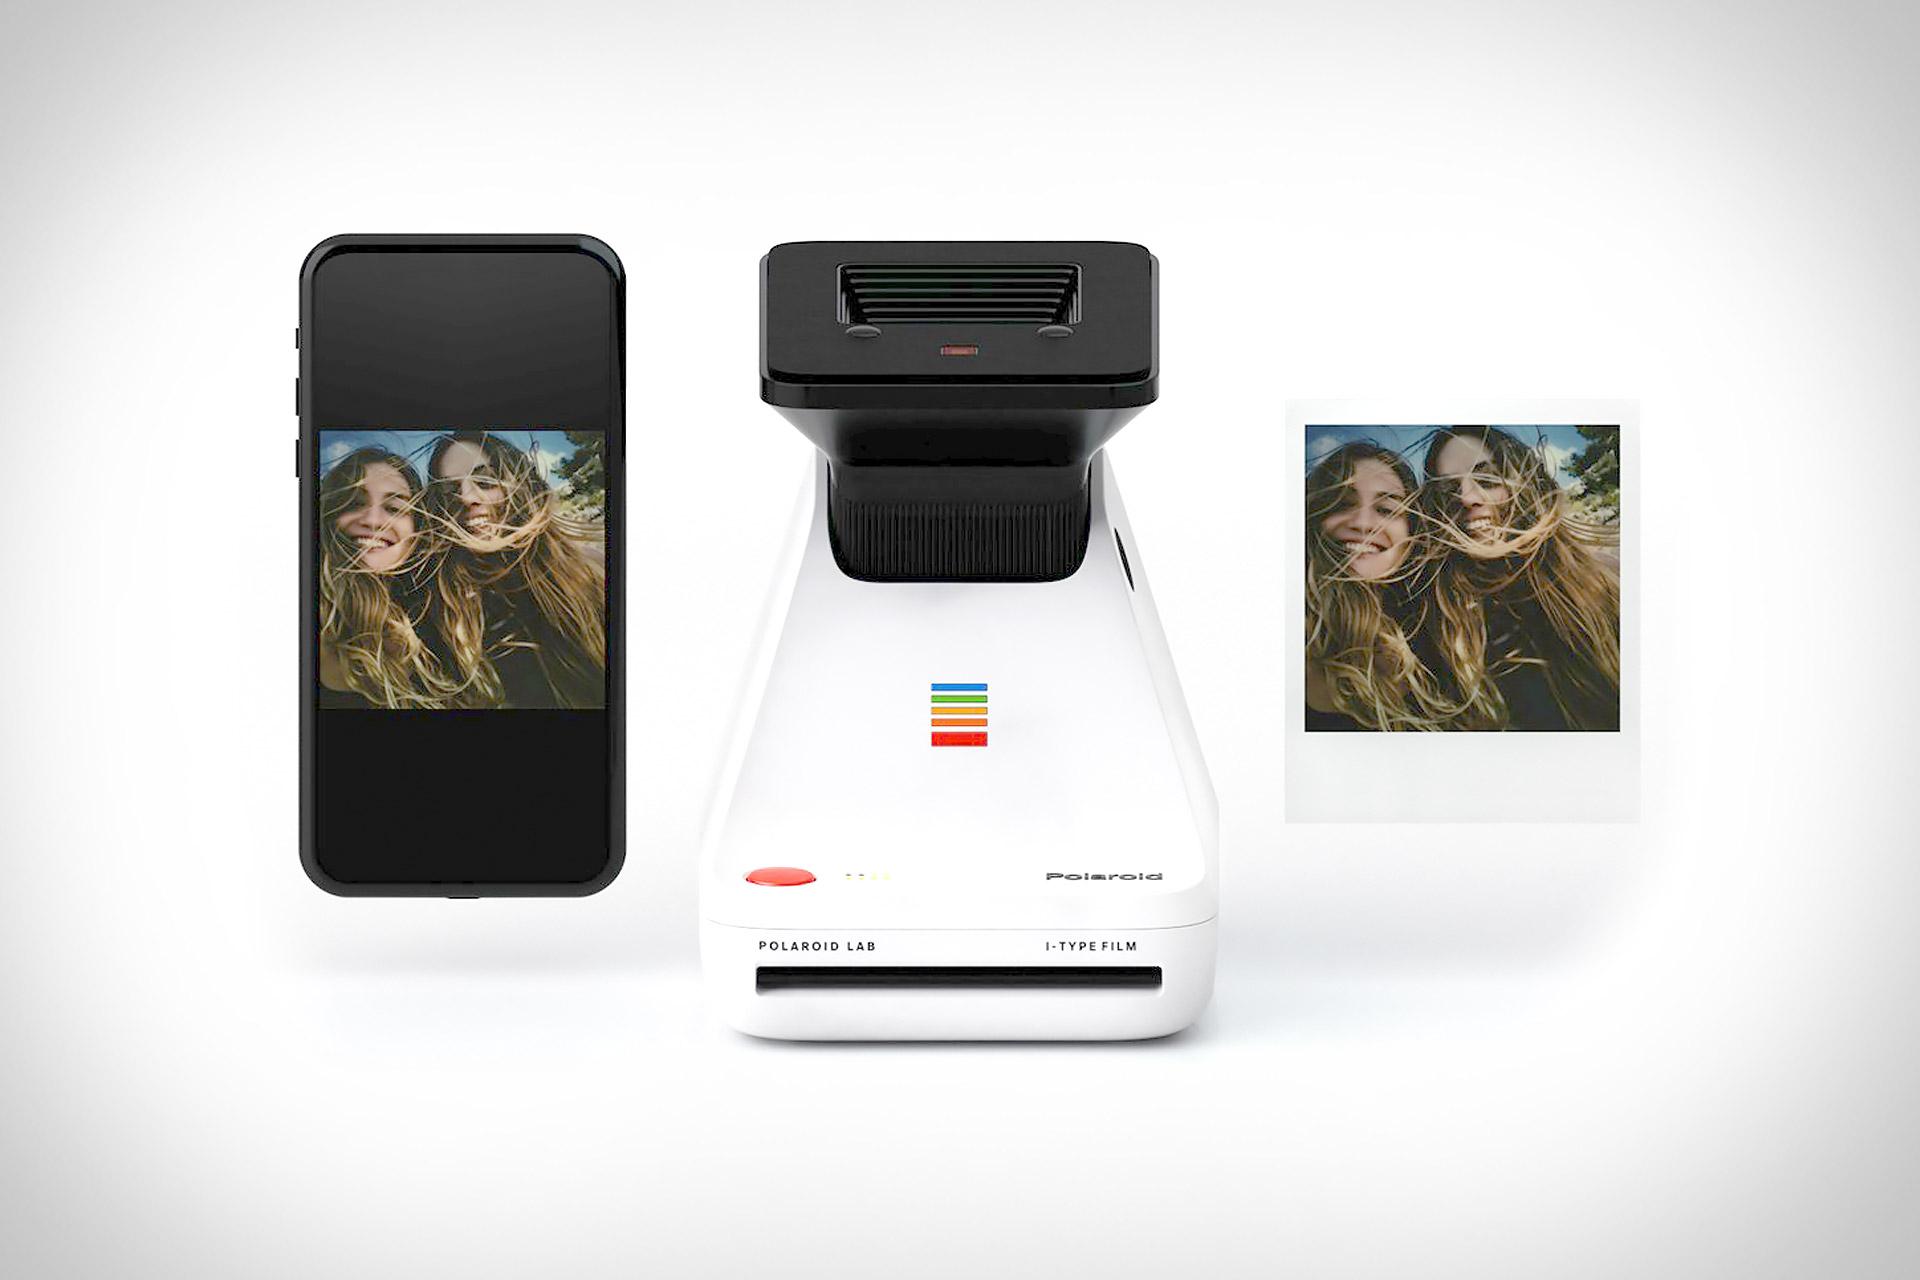 Polaroid Lab Photo Maker